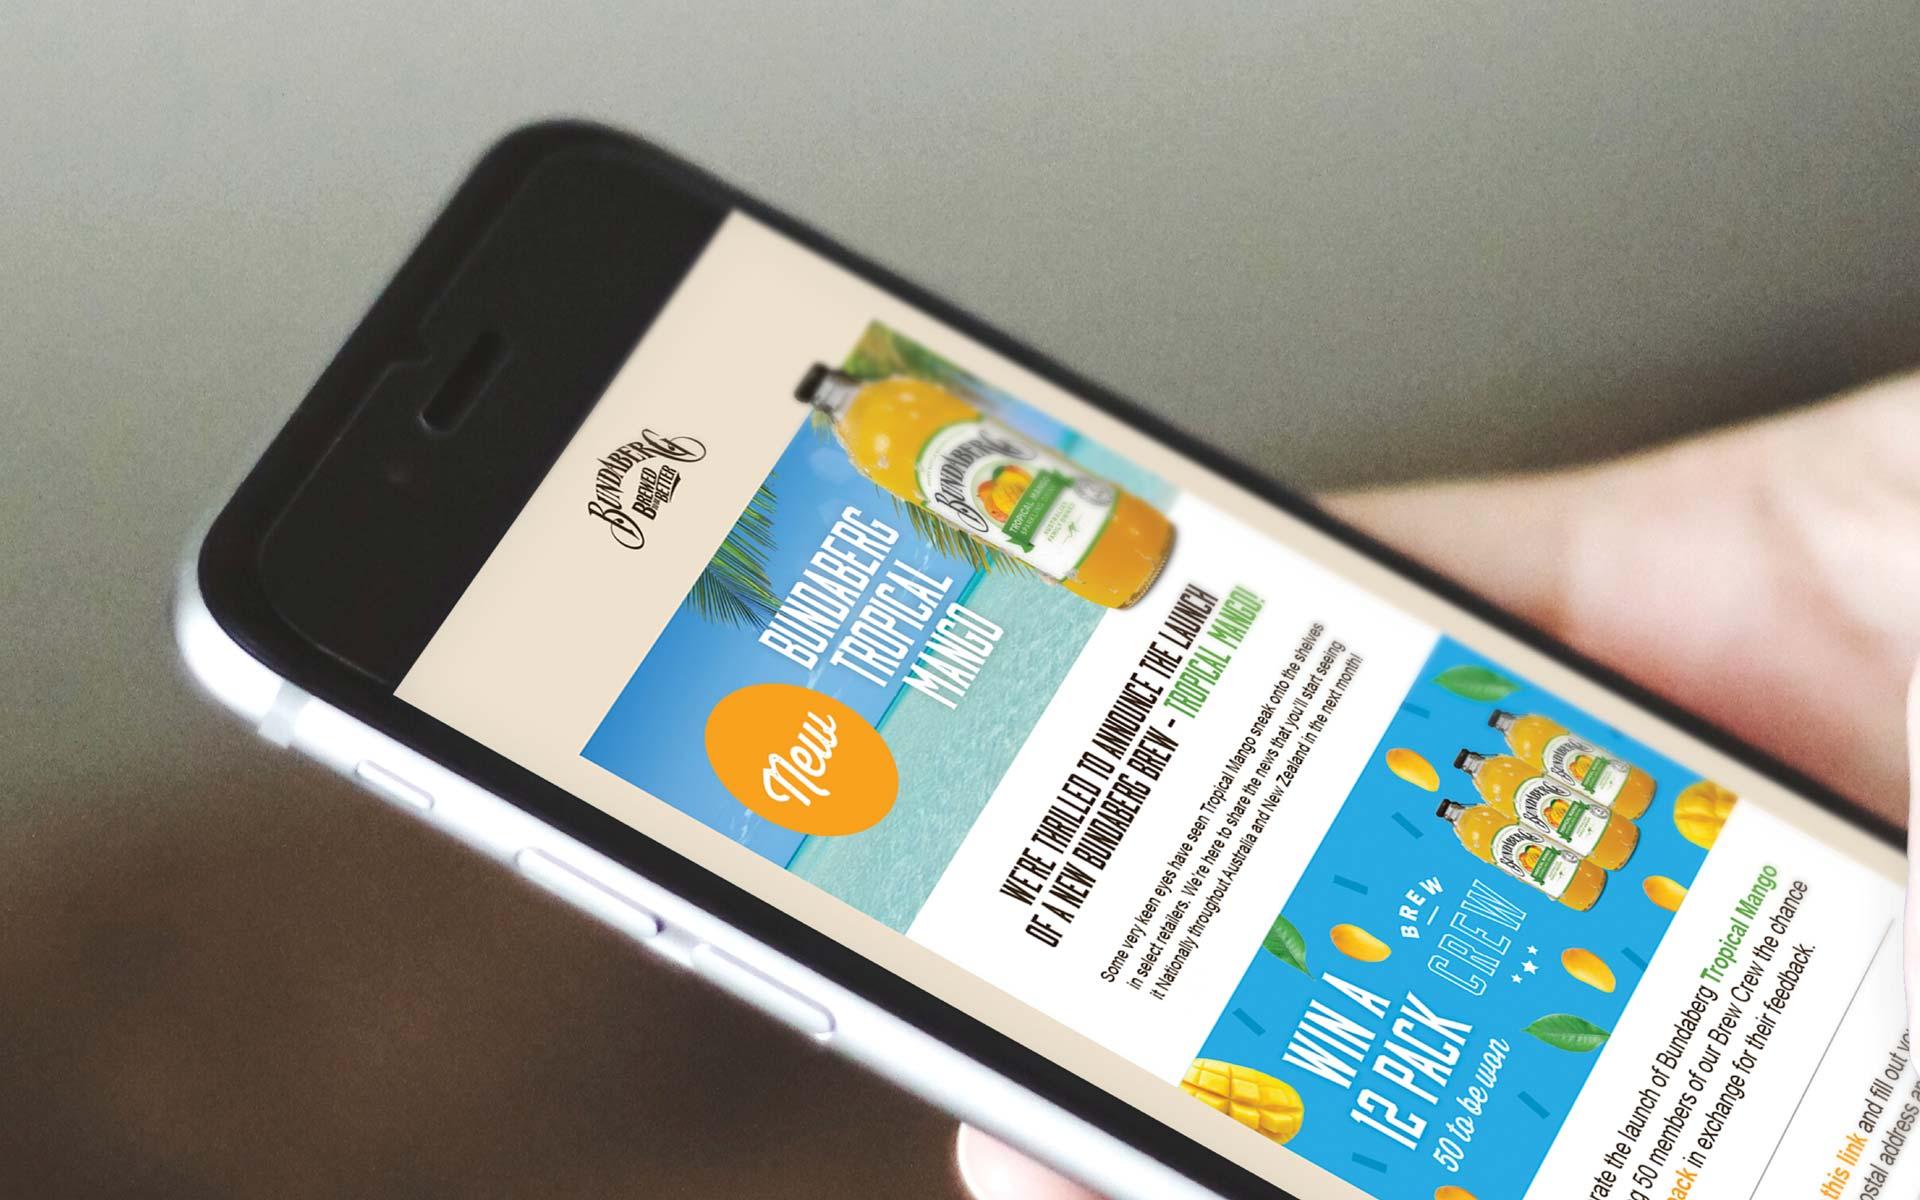 Bundaberg Brewed Drinks Digital Design eDM design